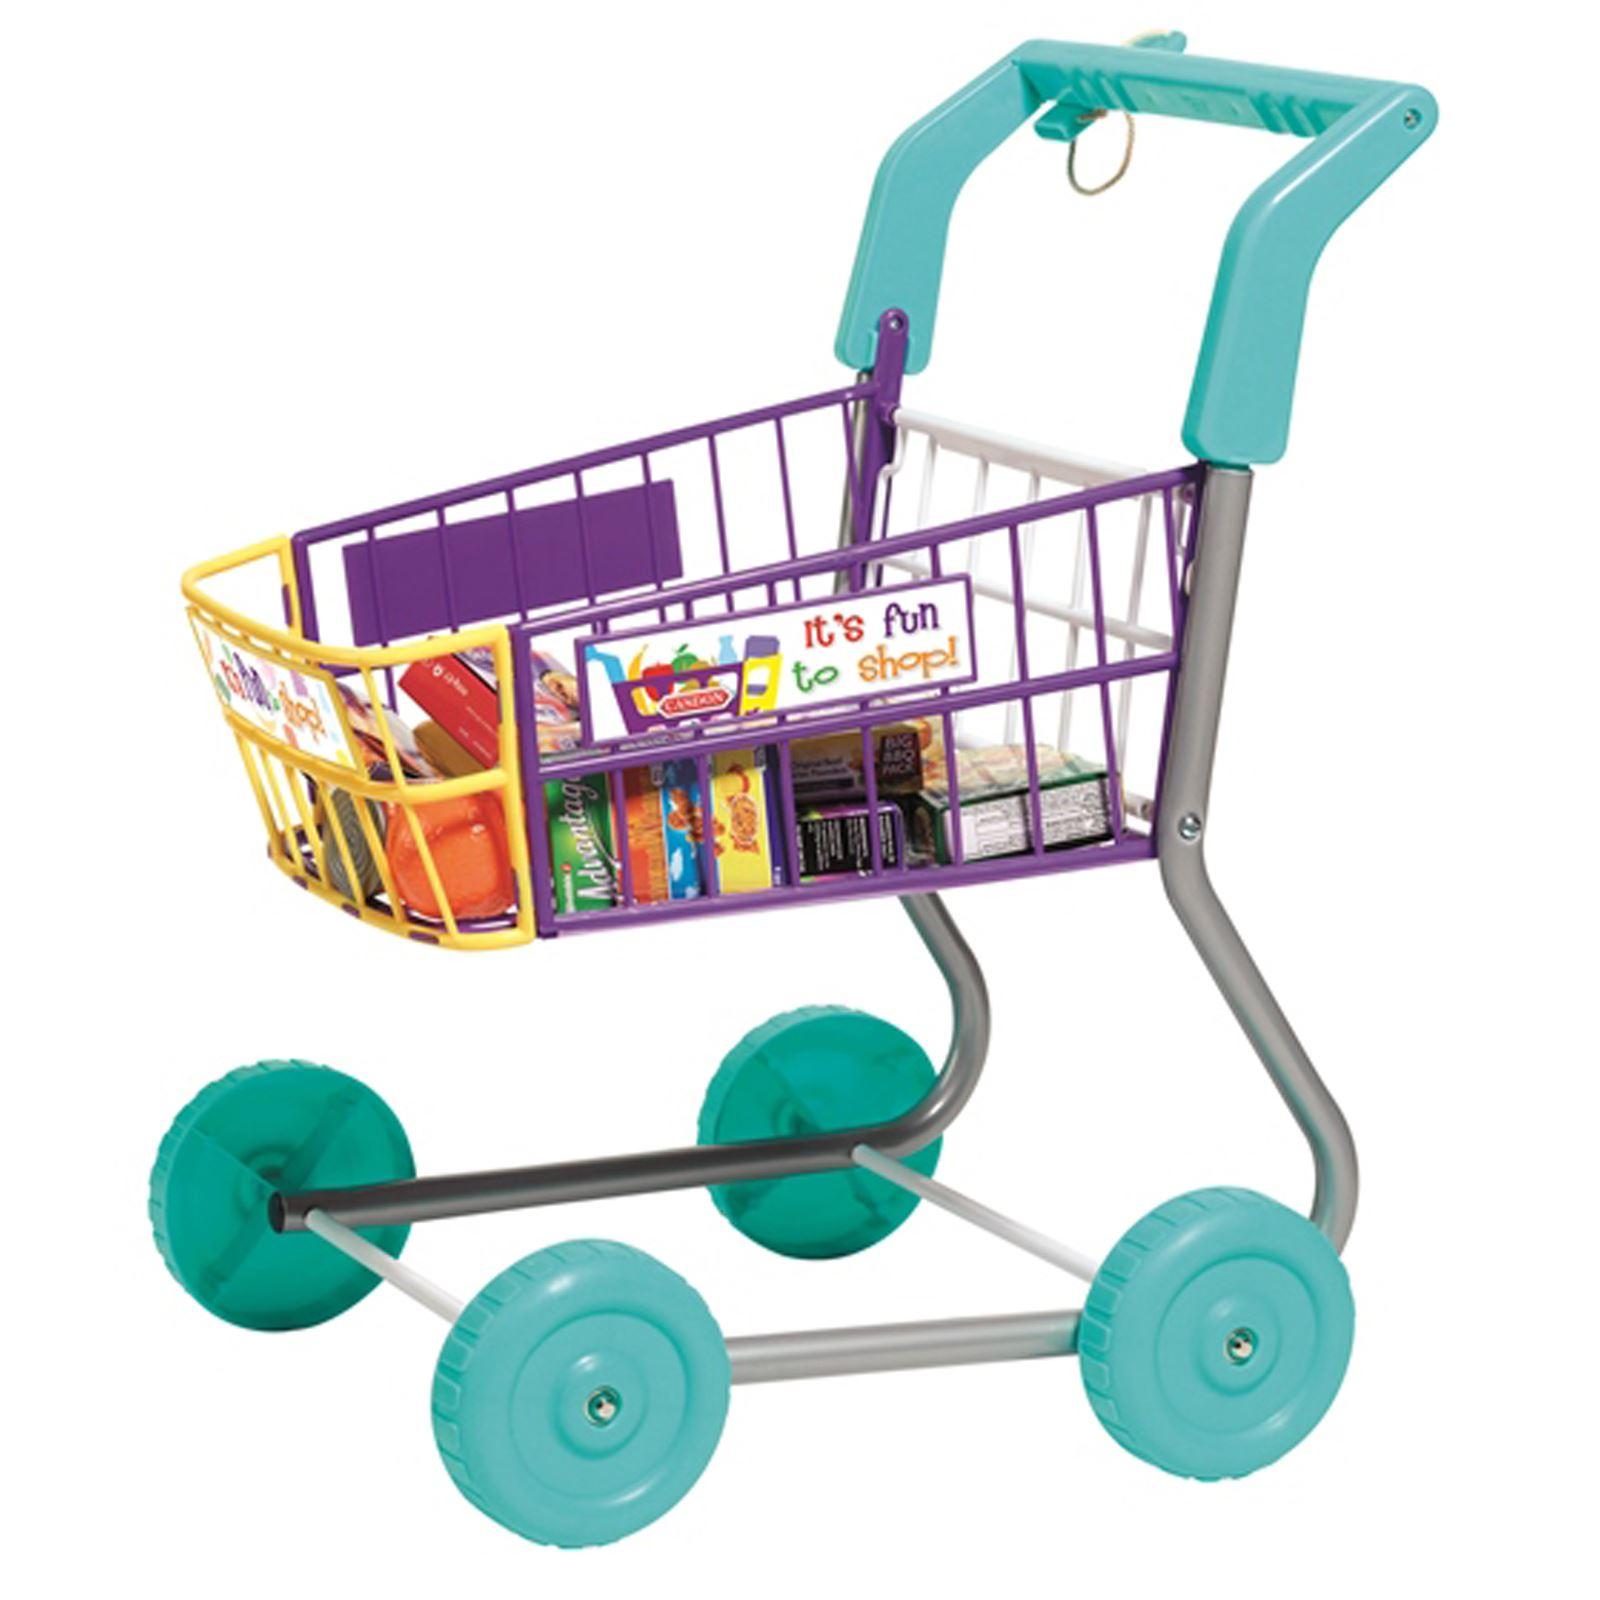 Casdon Chariot DE Shopping Jouet Little Shopper A Faire